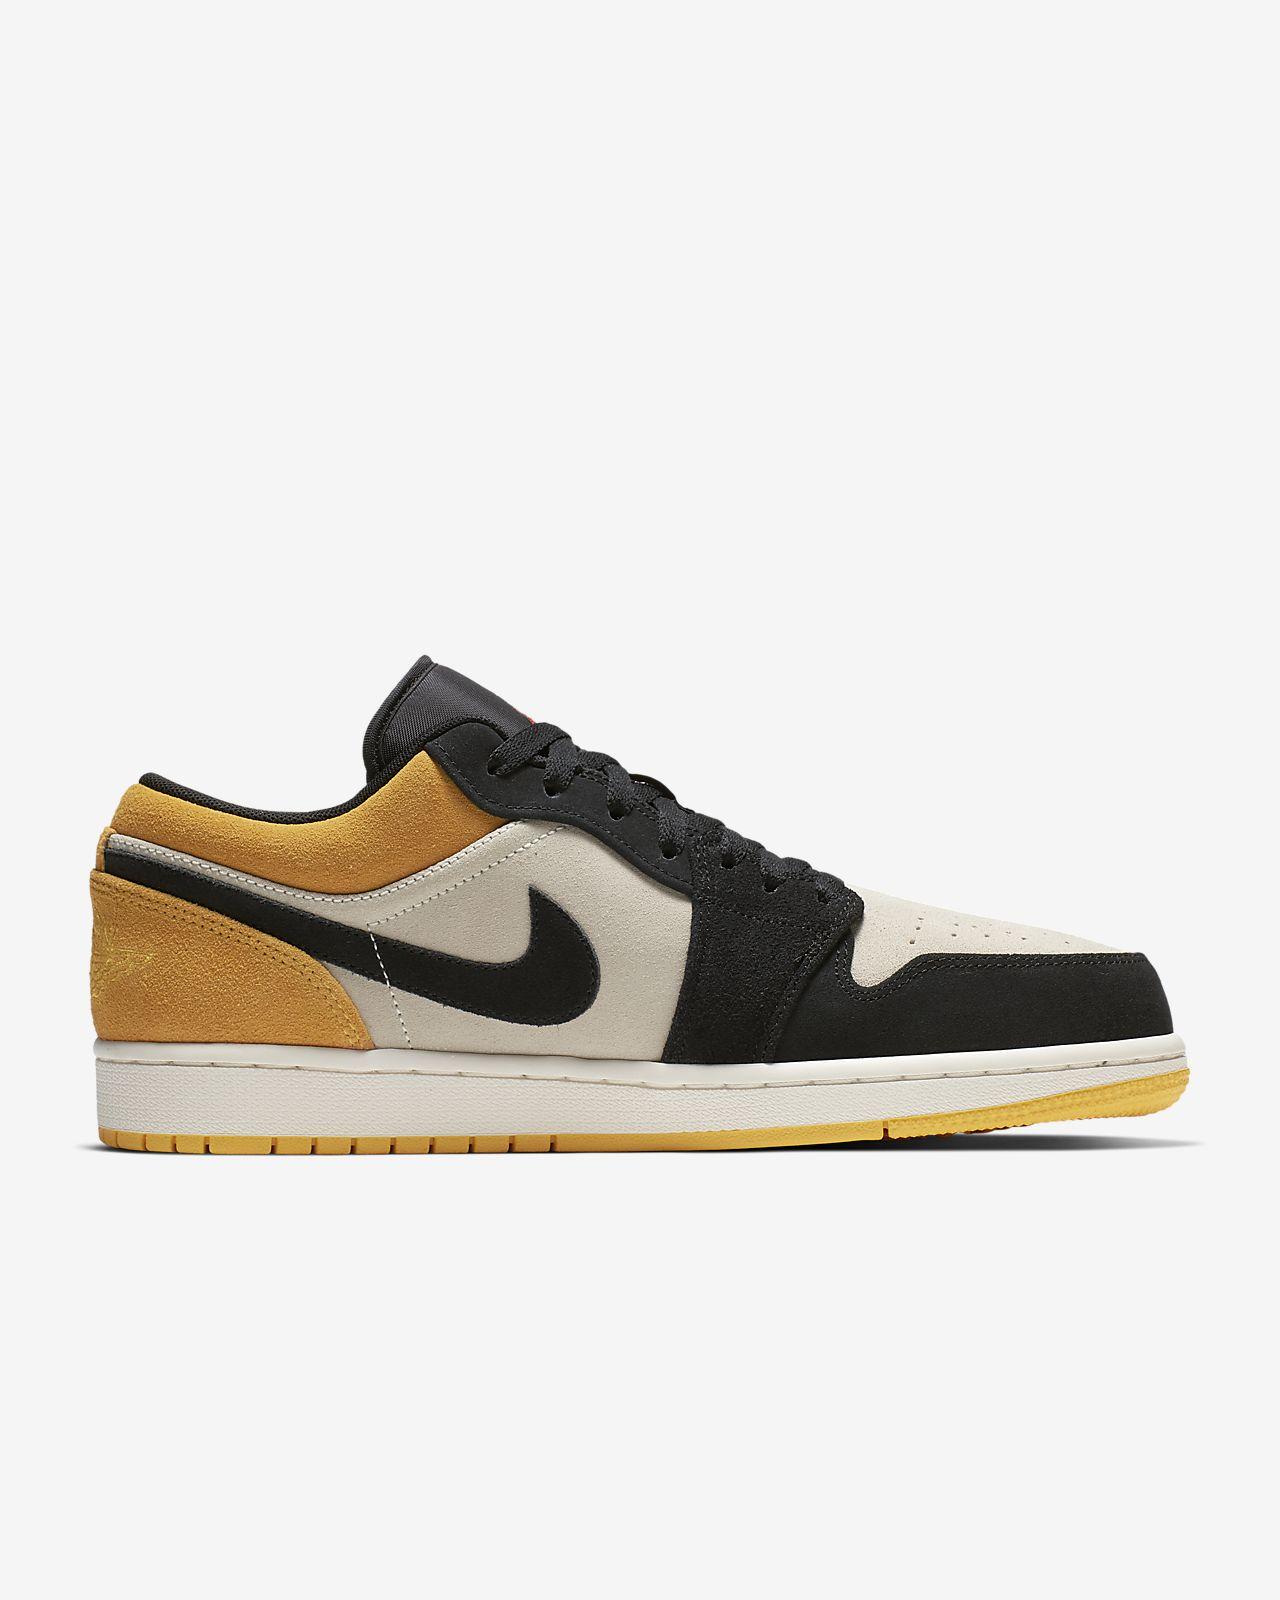 a23e3b4414b49d Air Jordan 1 Low Men s Shoe. Nike.com PT